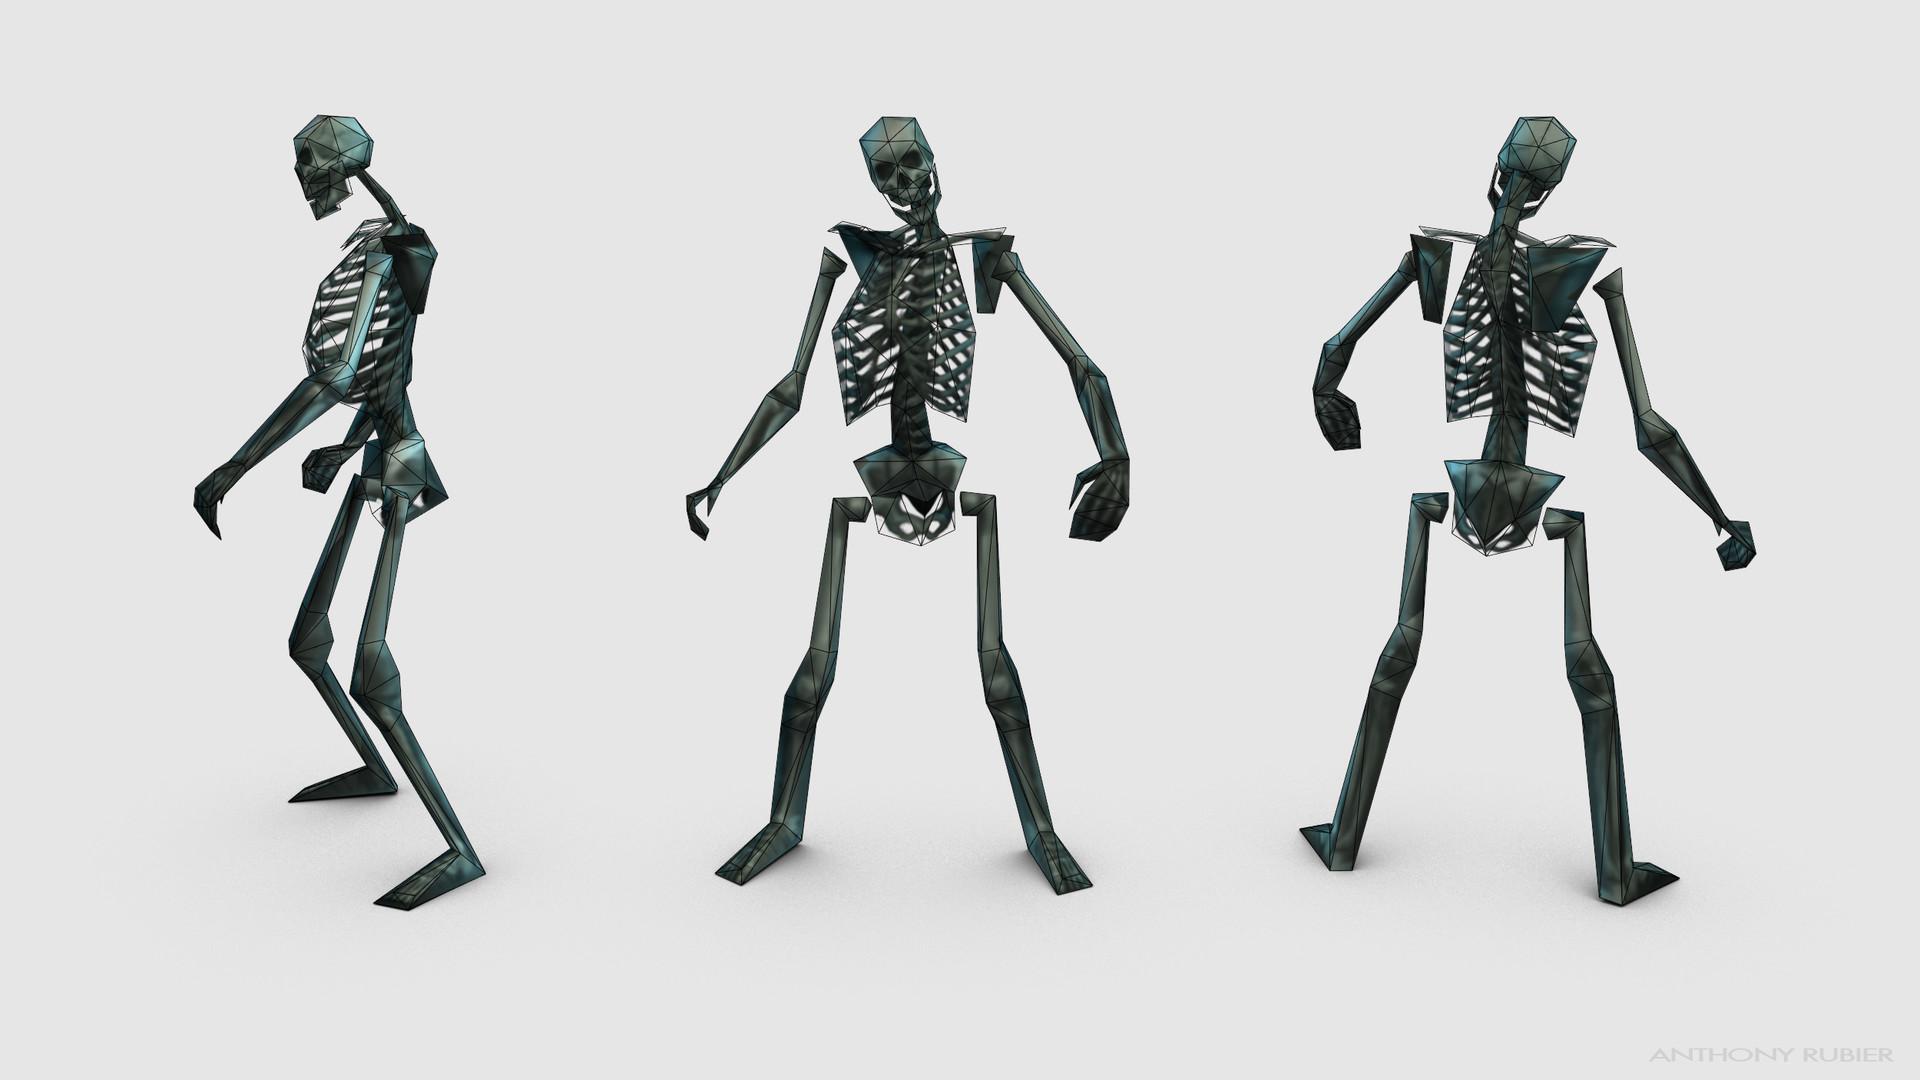 Anthony rubier render mesh squelette 2